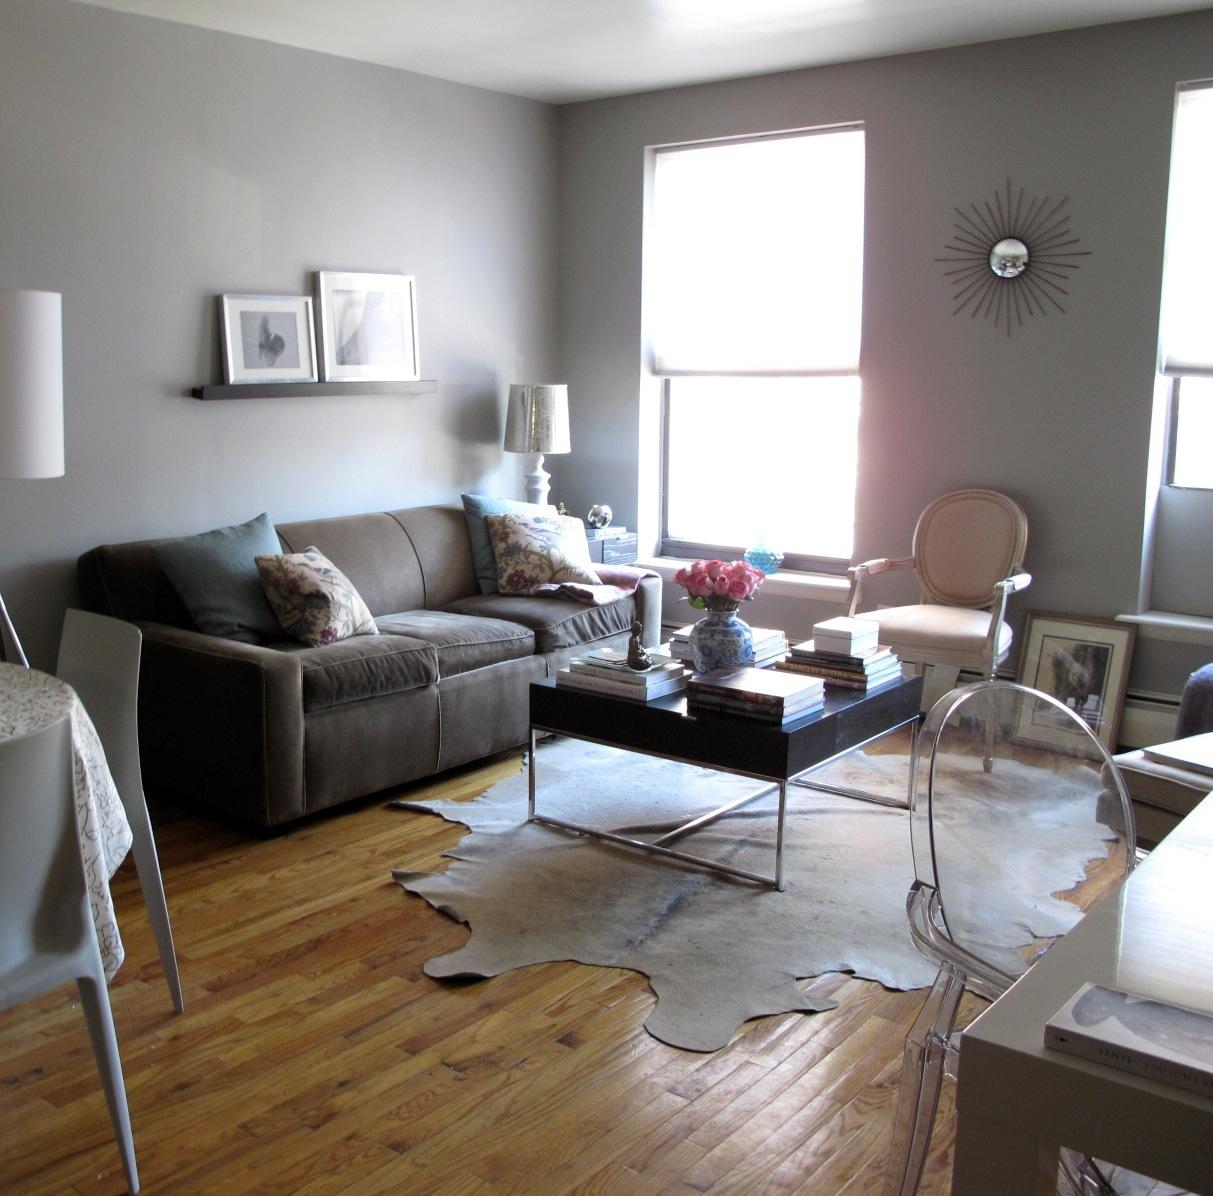 Nicole's living room